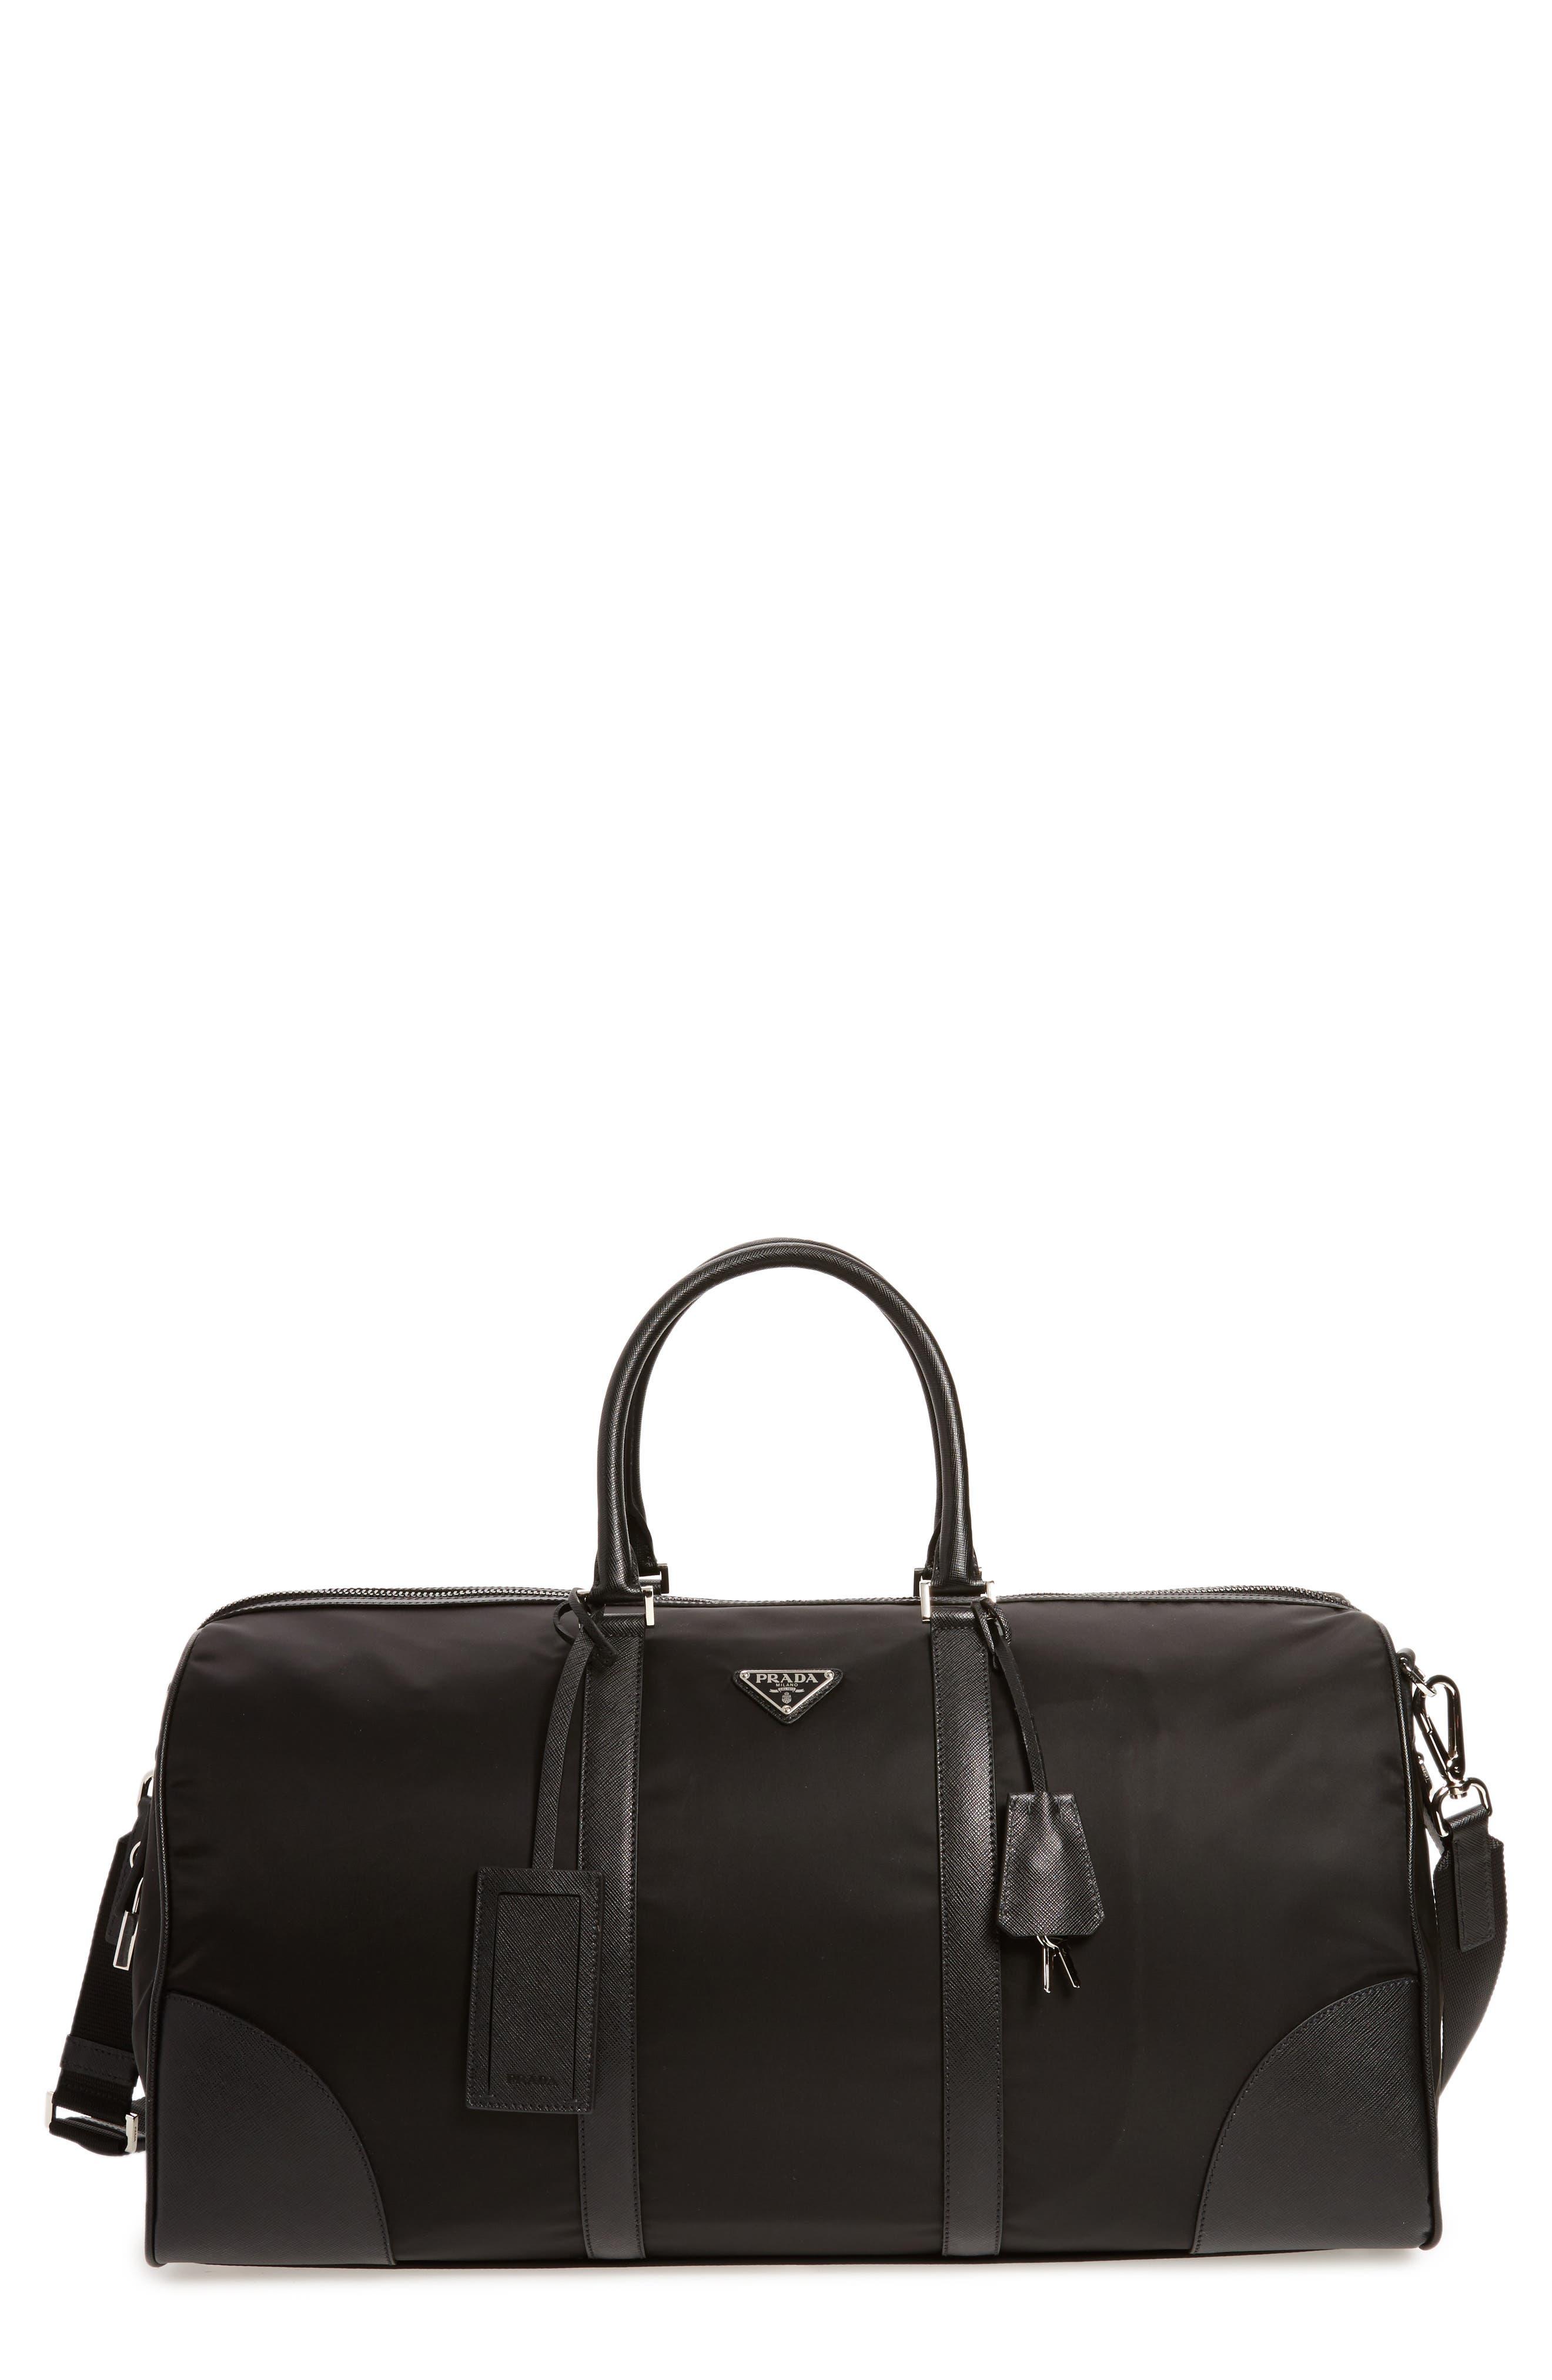 Nylon & Saffiano Leather Bowling Bag,                             Main thumbnail 1, color,                             001